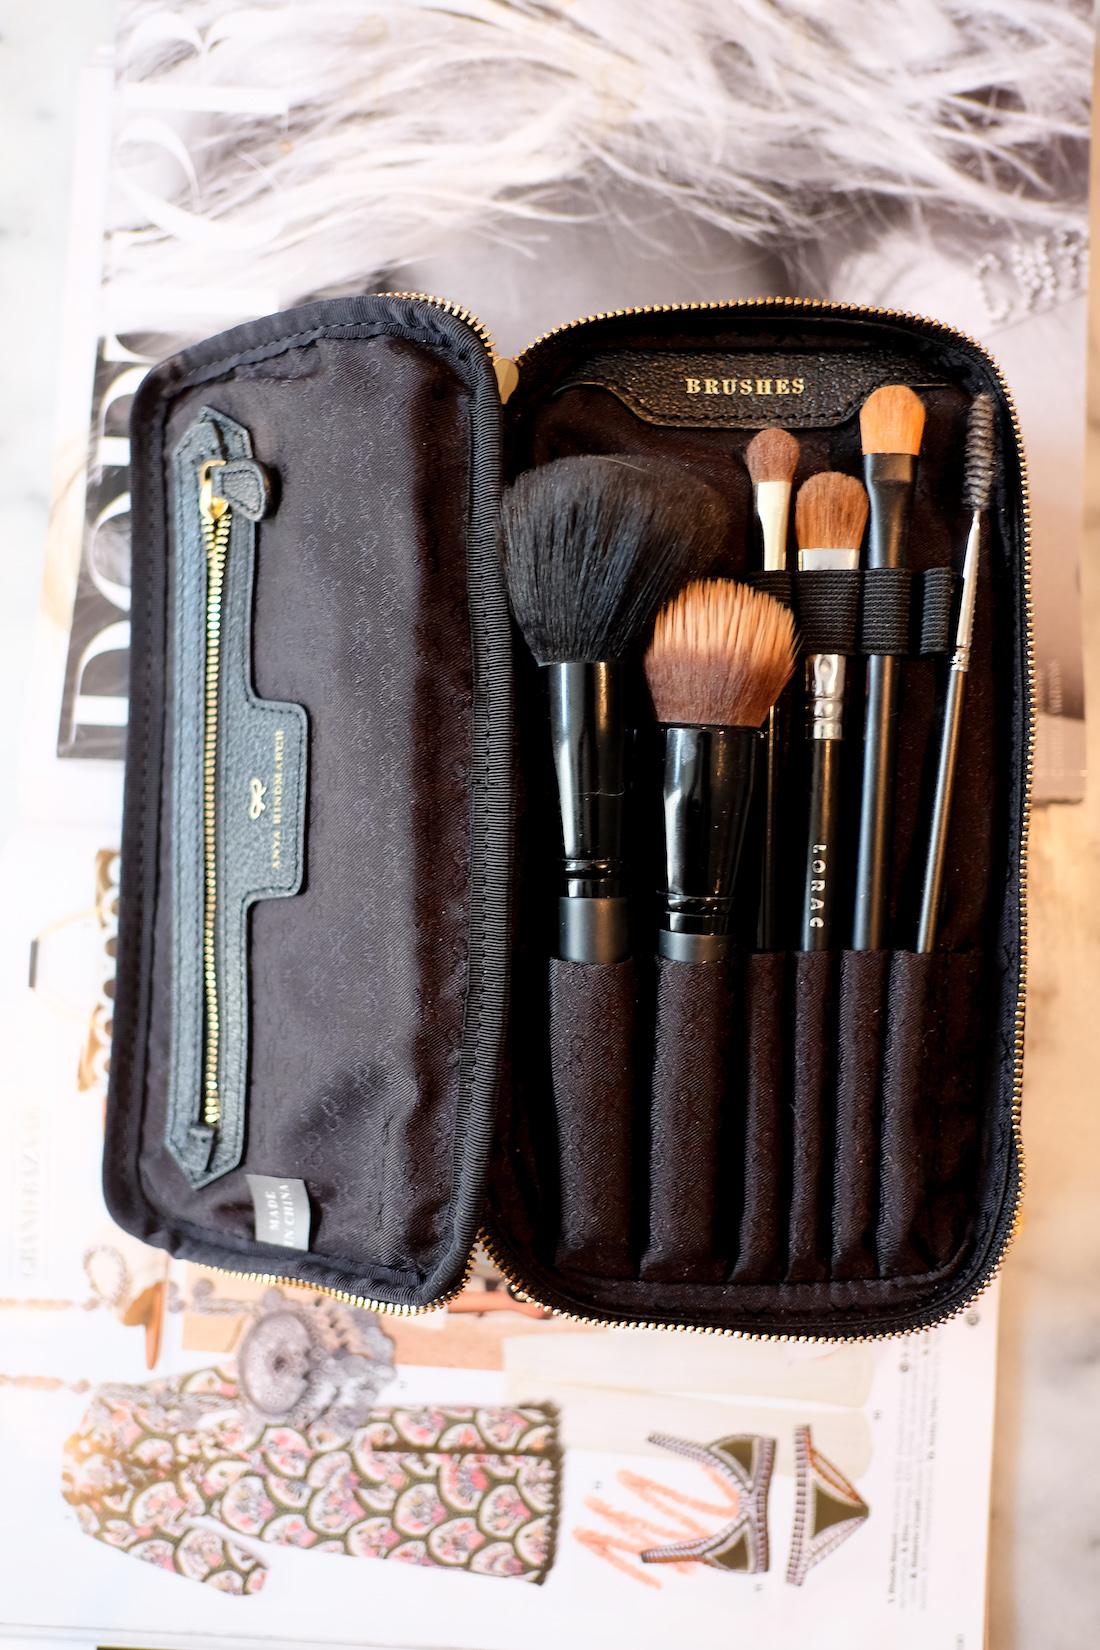 Anya Hindmarch makeup bag